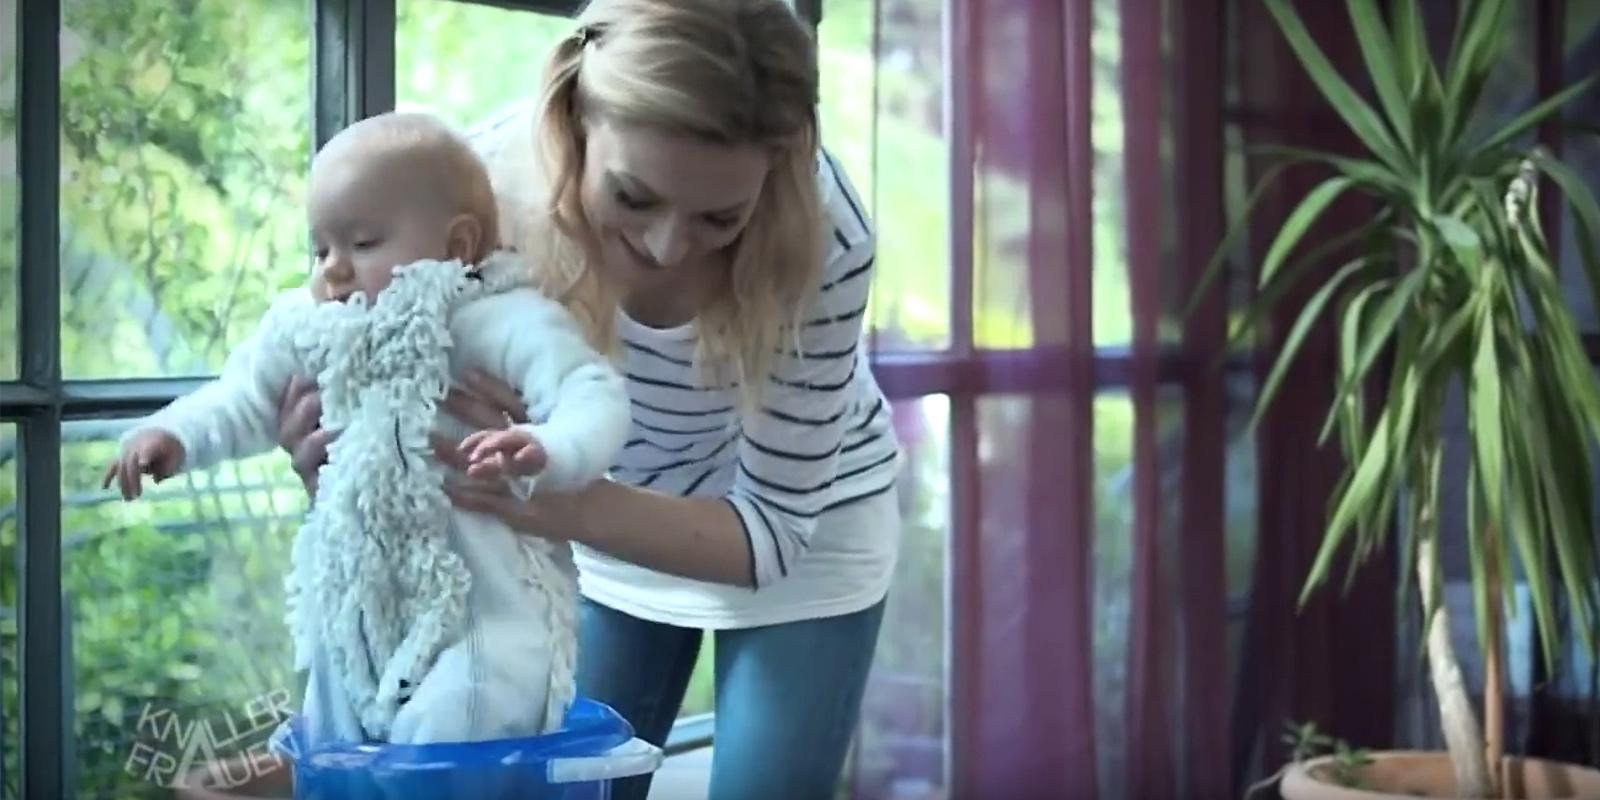 Knallerfrauen-Babymop